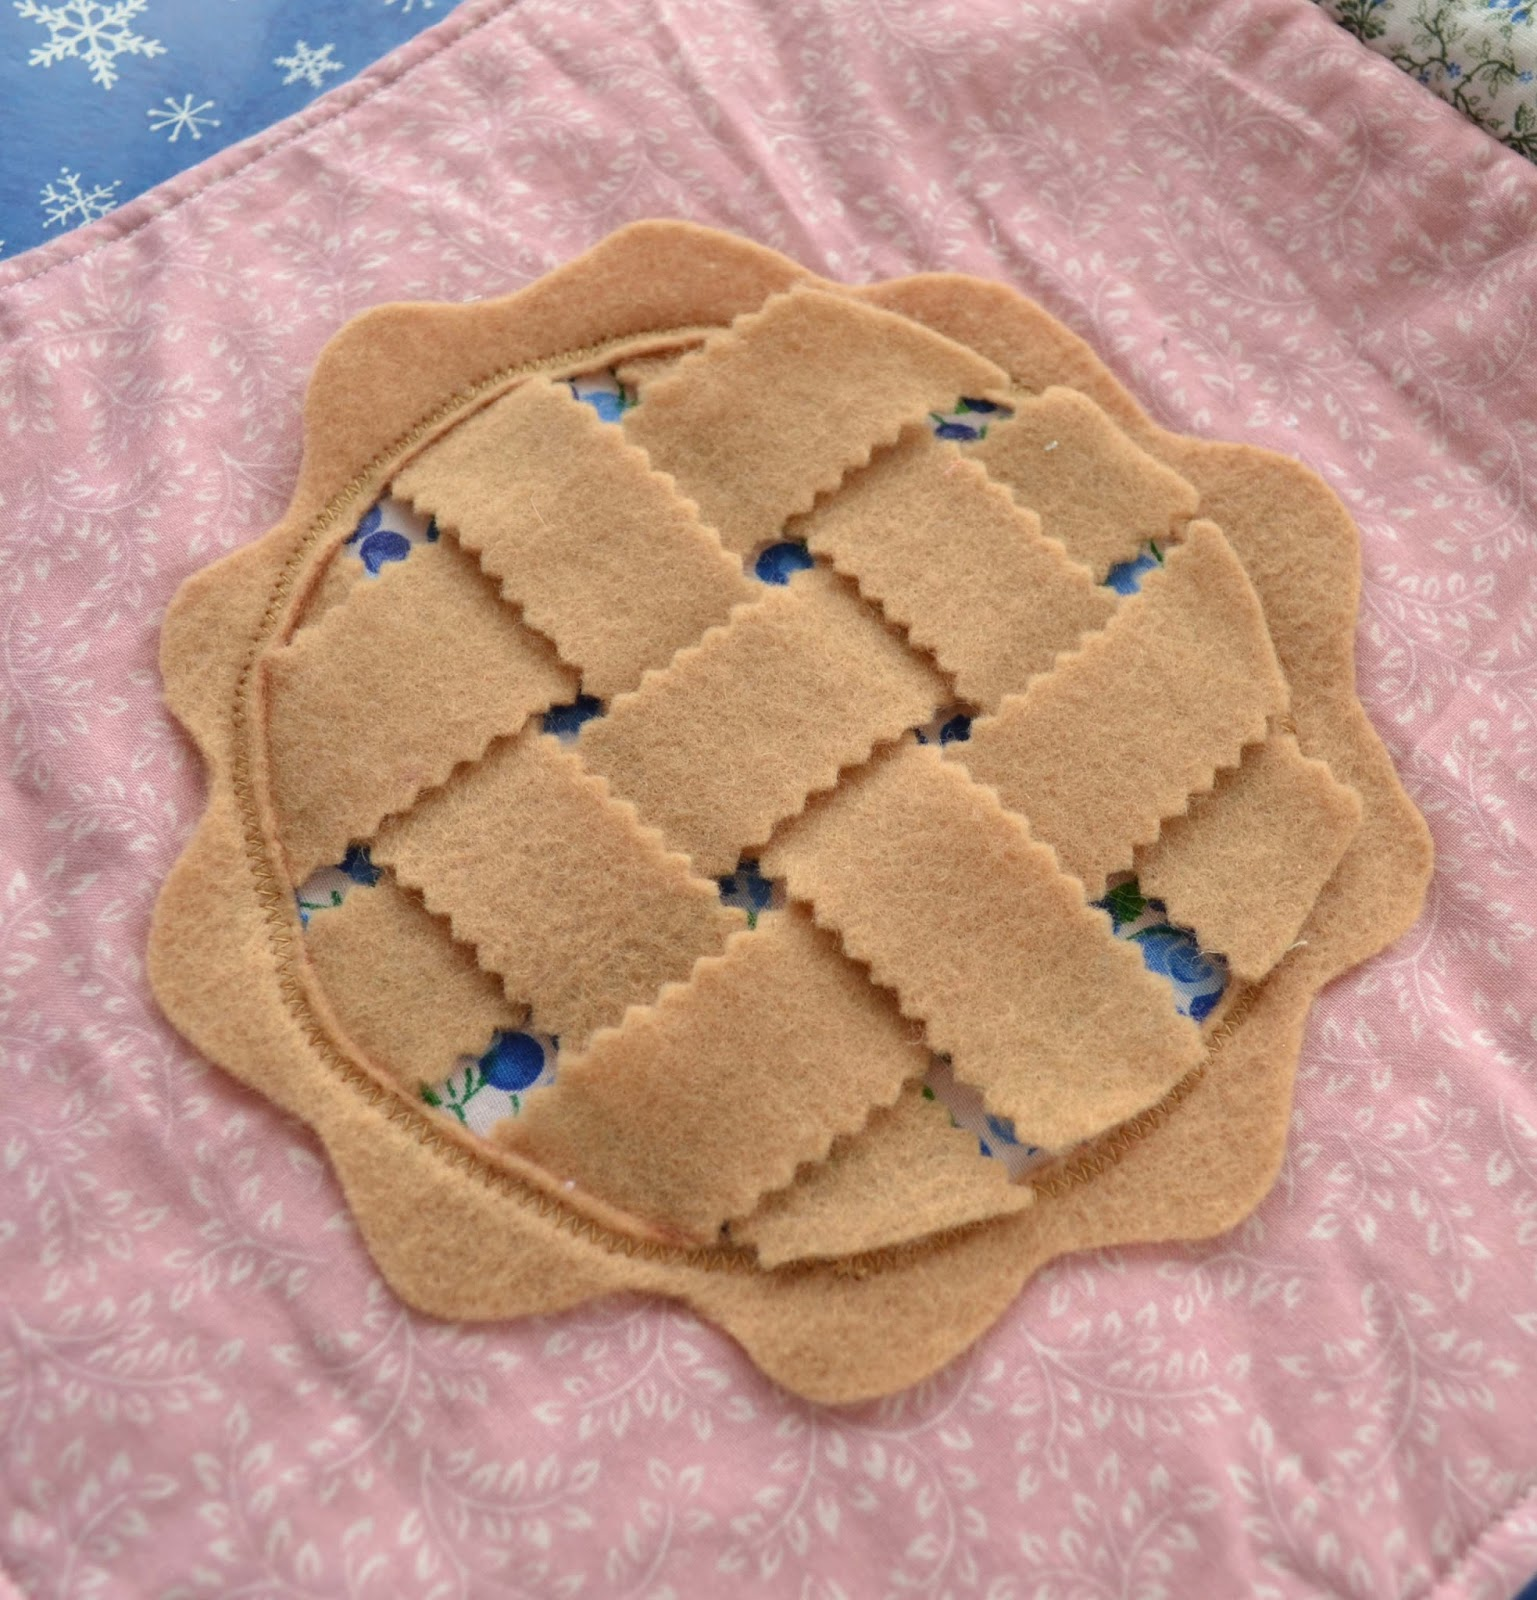 Felt Pie Crust